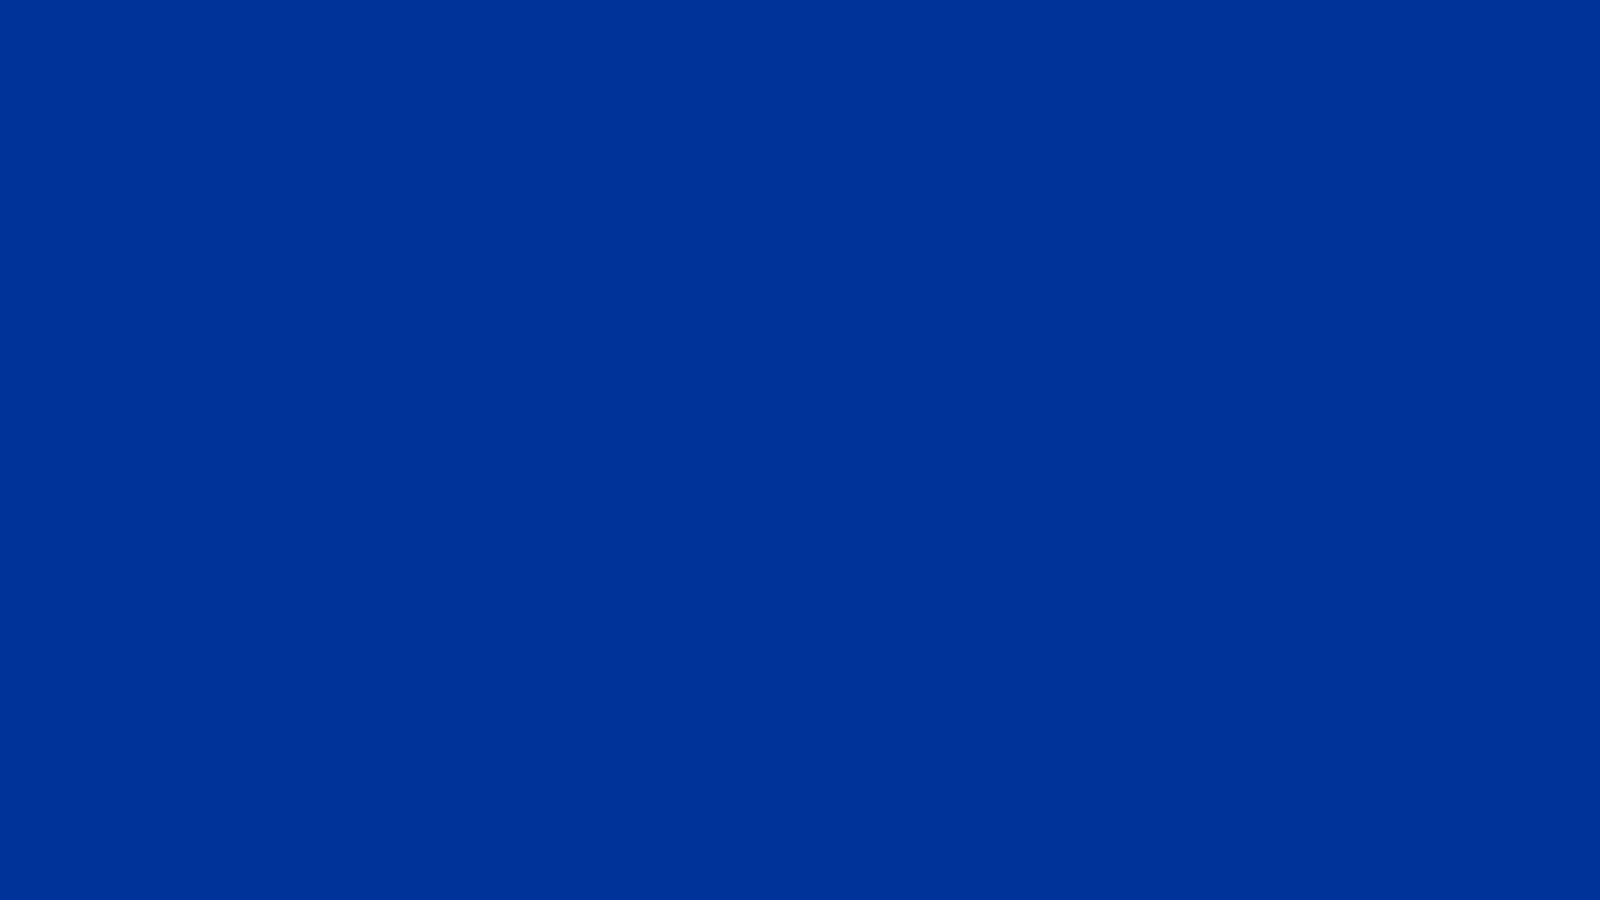 1600x900 Dark Powder Blue Solid Color Background